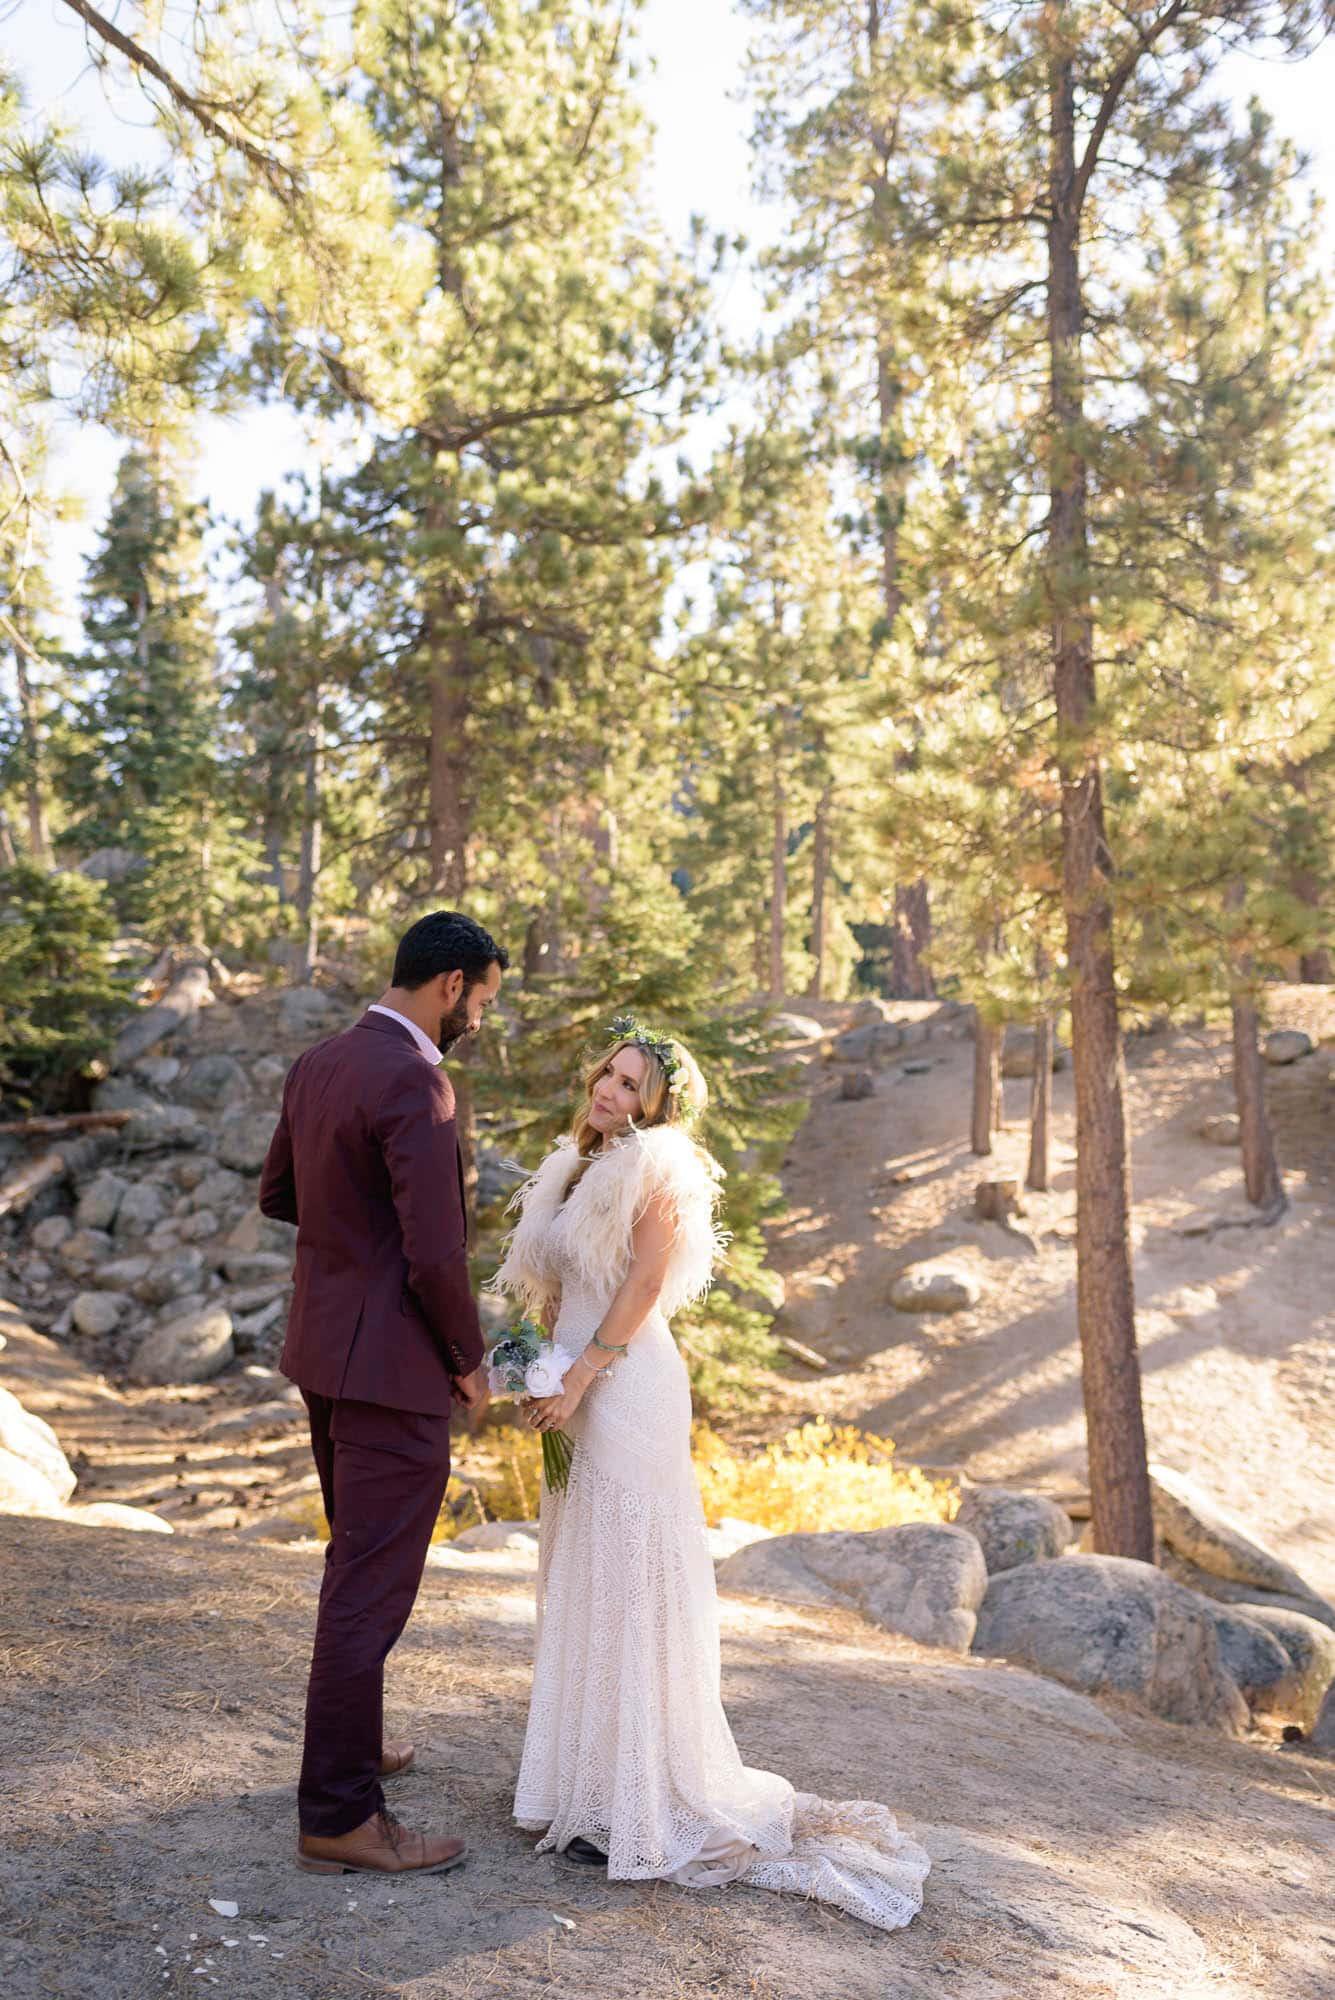 013_Alan_and_Heidi_Wedding_Natalie_Mike